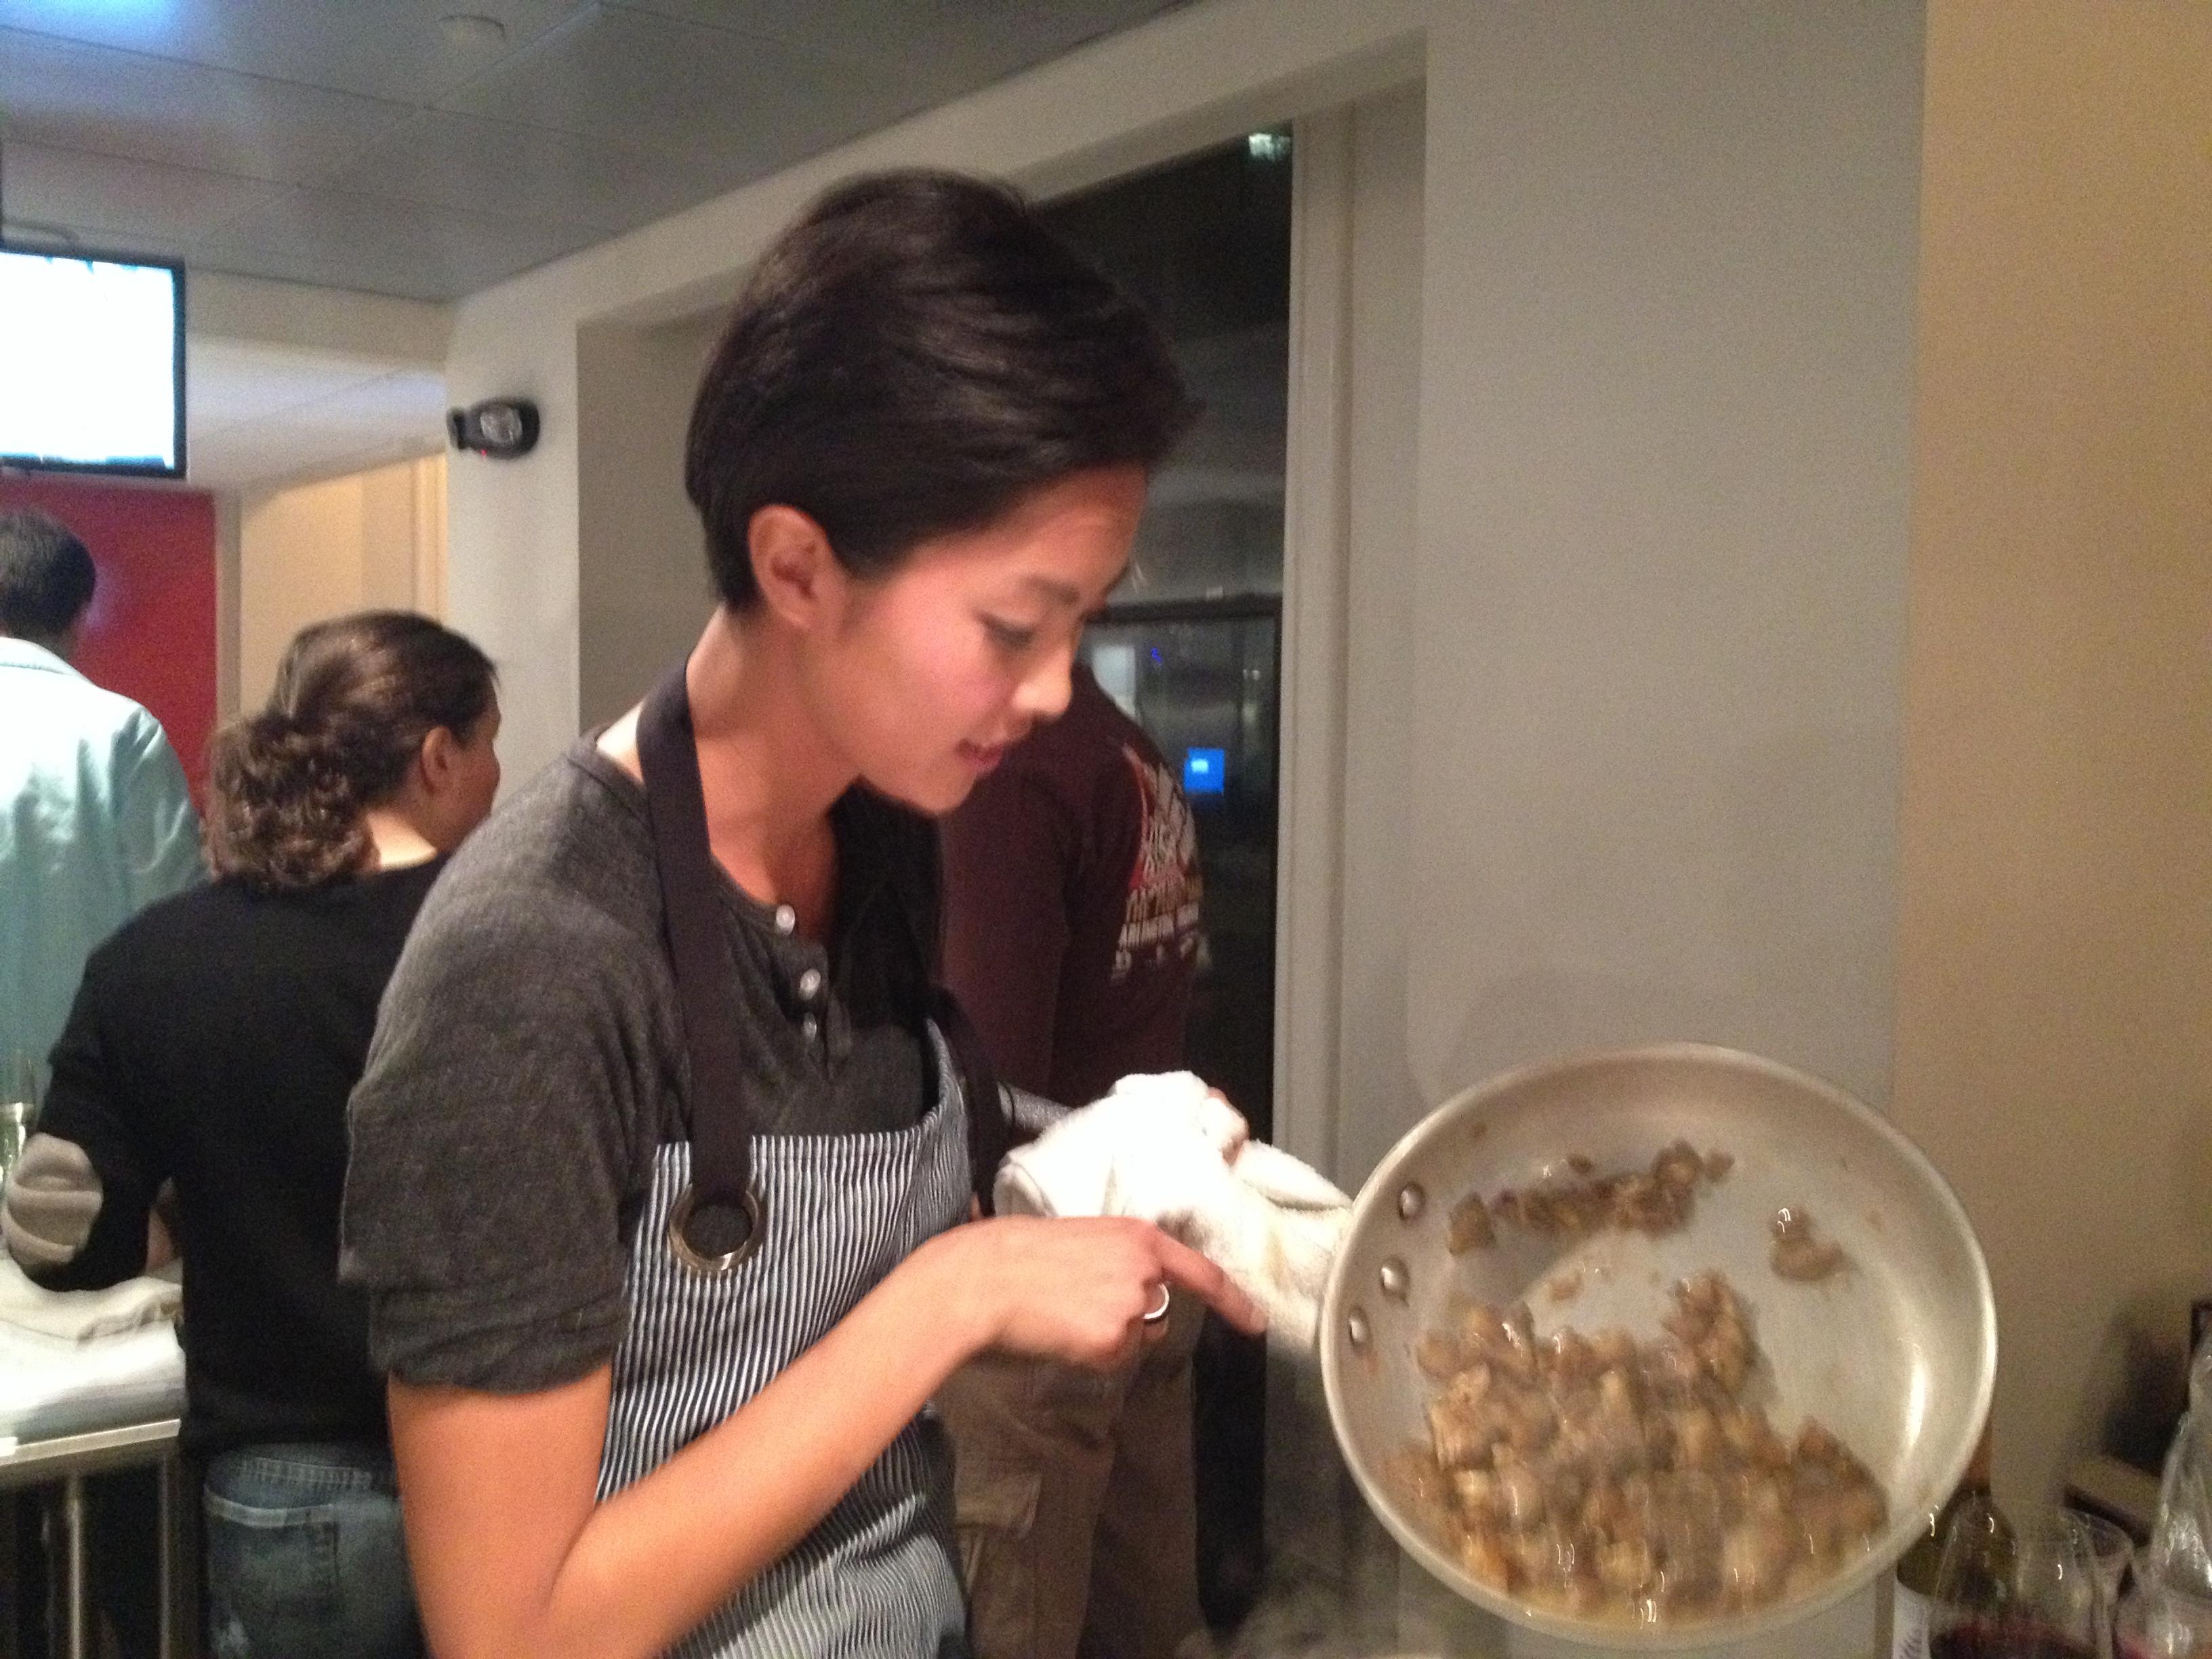 Kristen Kish with pasta